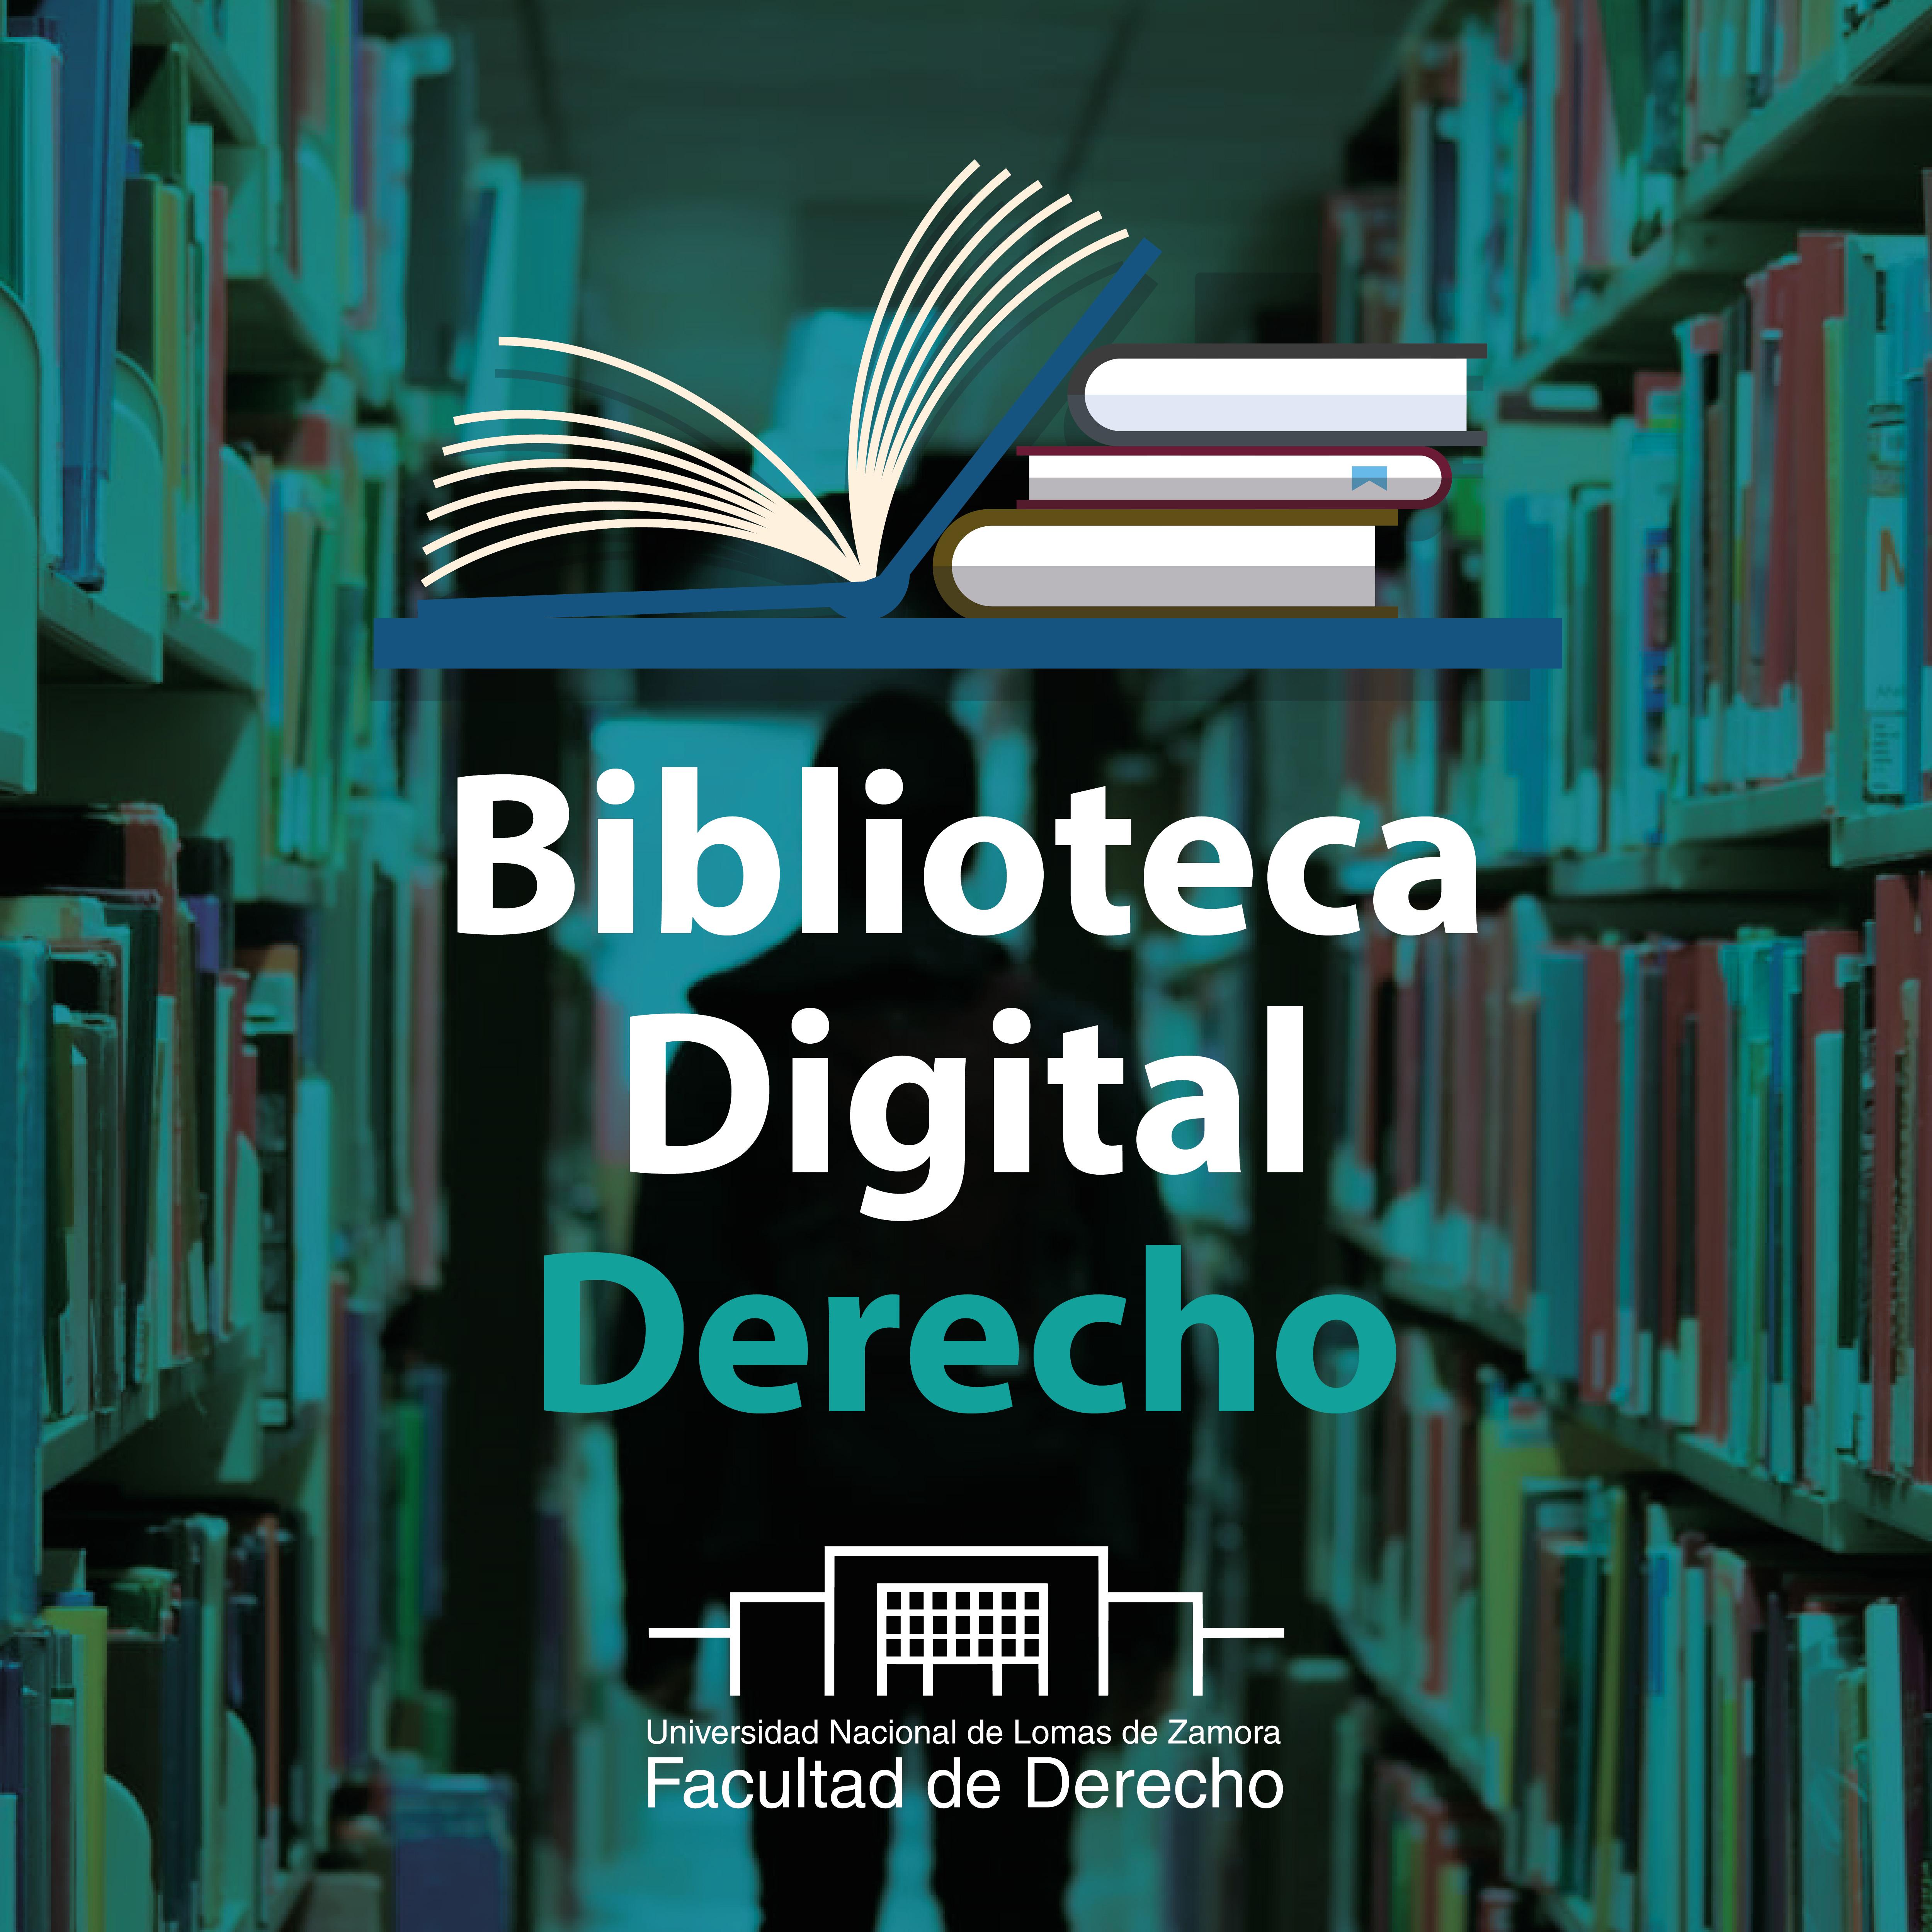 Biblioteca Digital Derecho